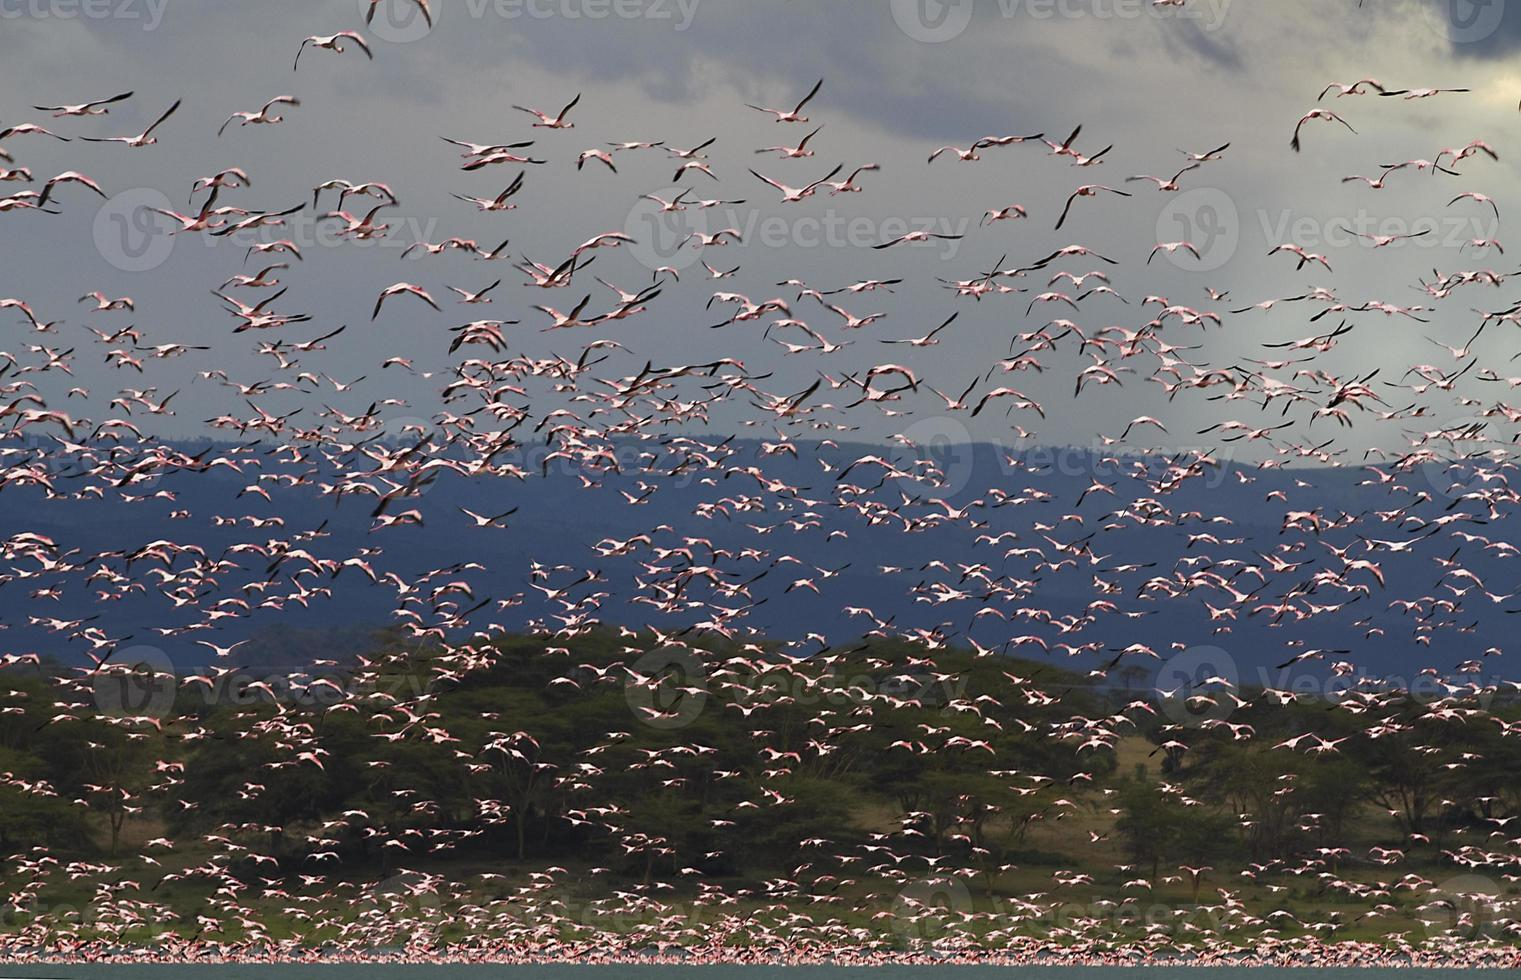 große Gruppe von Flamingos in Lake Oleden, Kenia foto